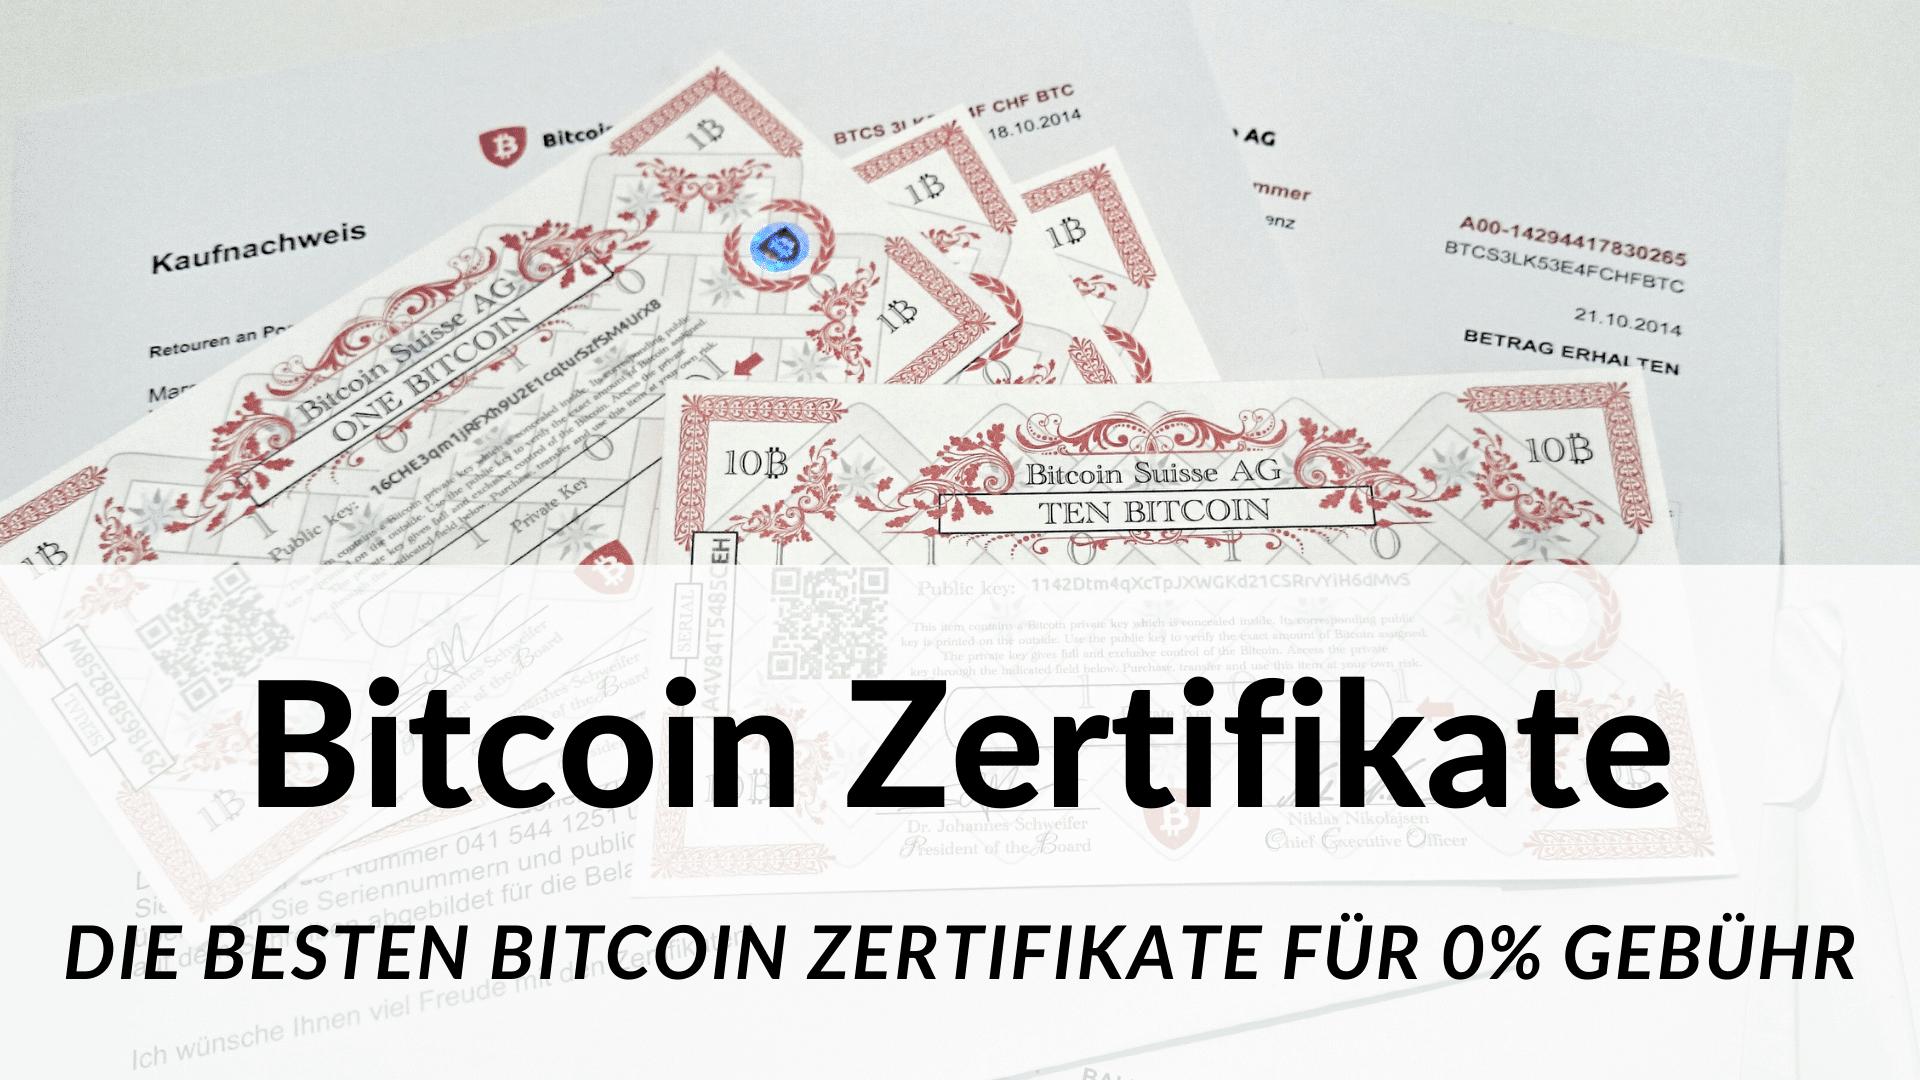 Bitcoin Zertifikate